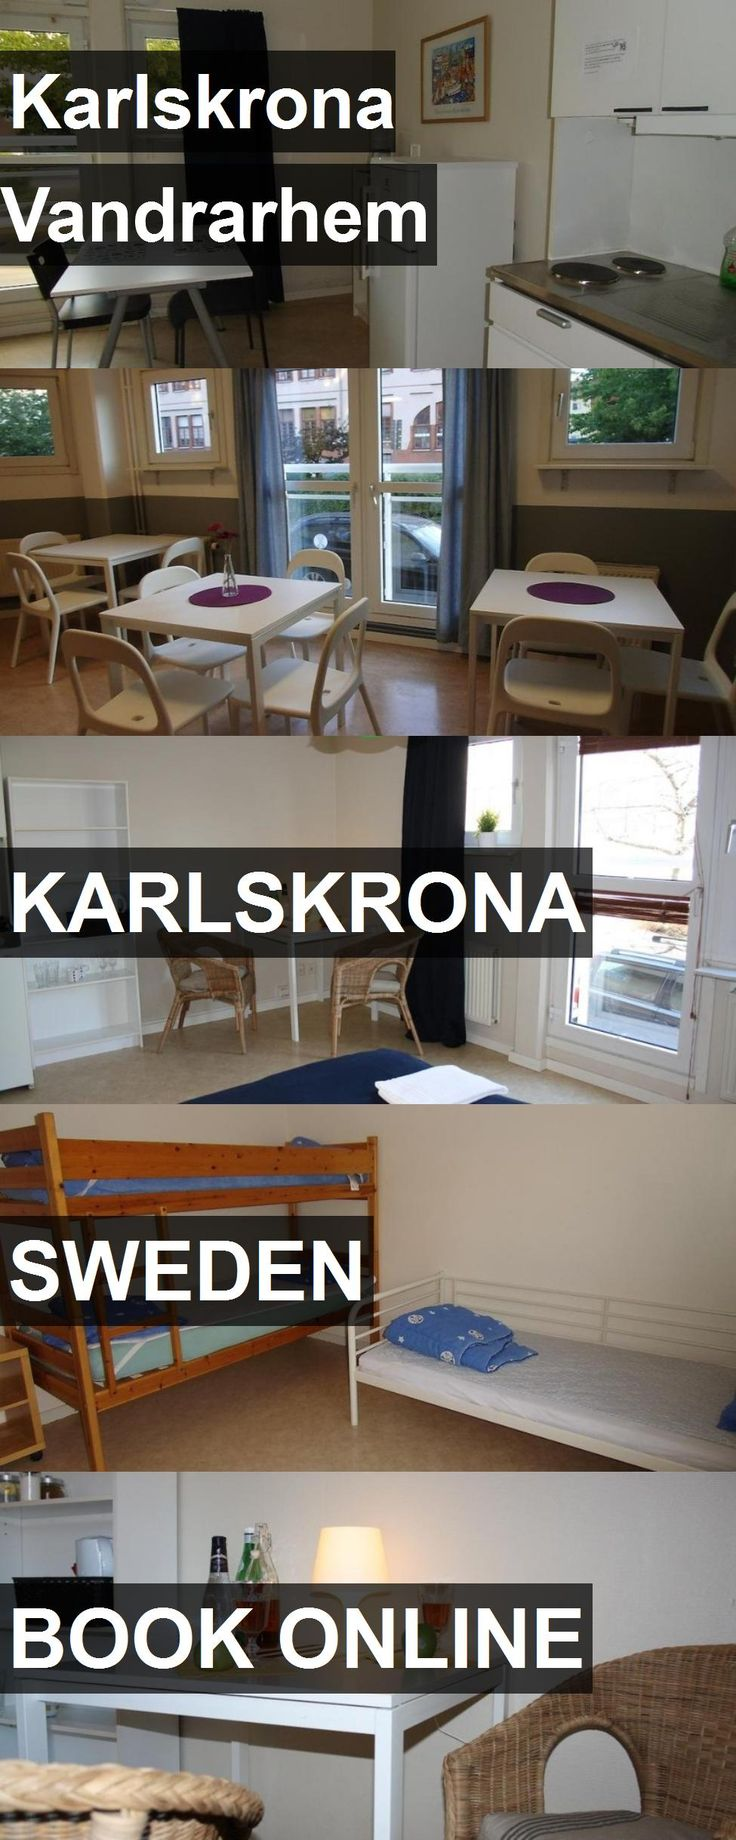 Hotel Karlskrona Vandrarhem in Karlskrona, Sweden. For more information, photos, reviews and best prices please follow the link. #Sweden #Karlskrona #travel #vacation #hotel